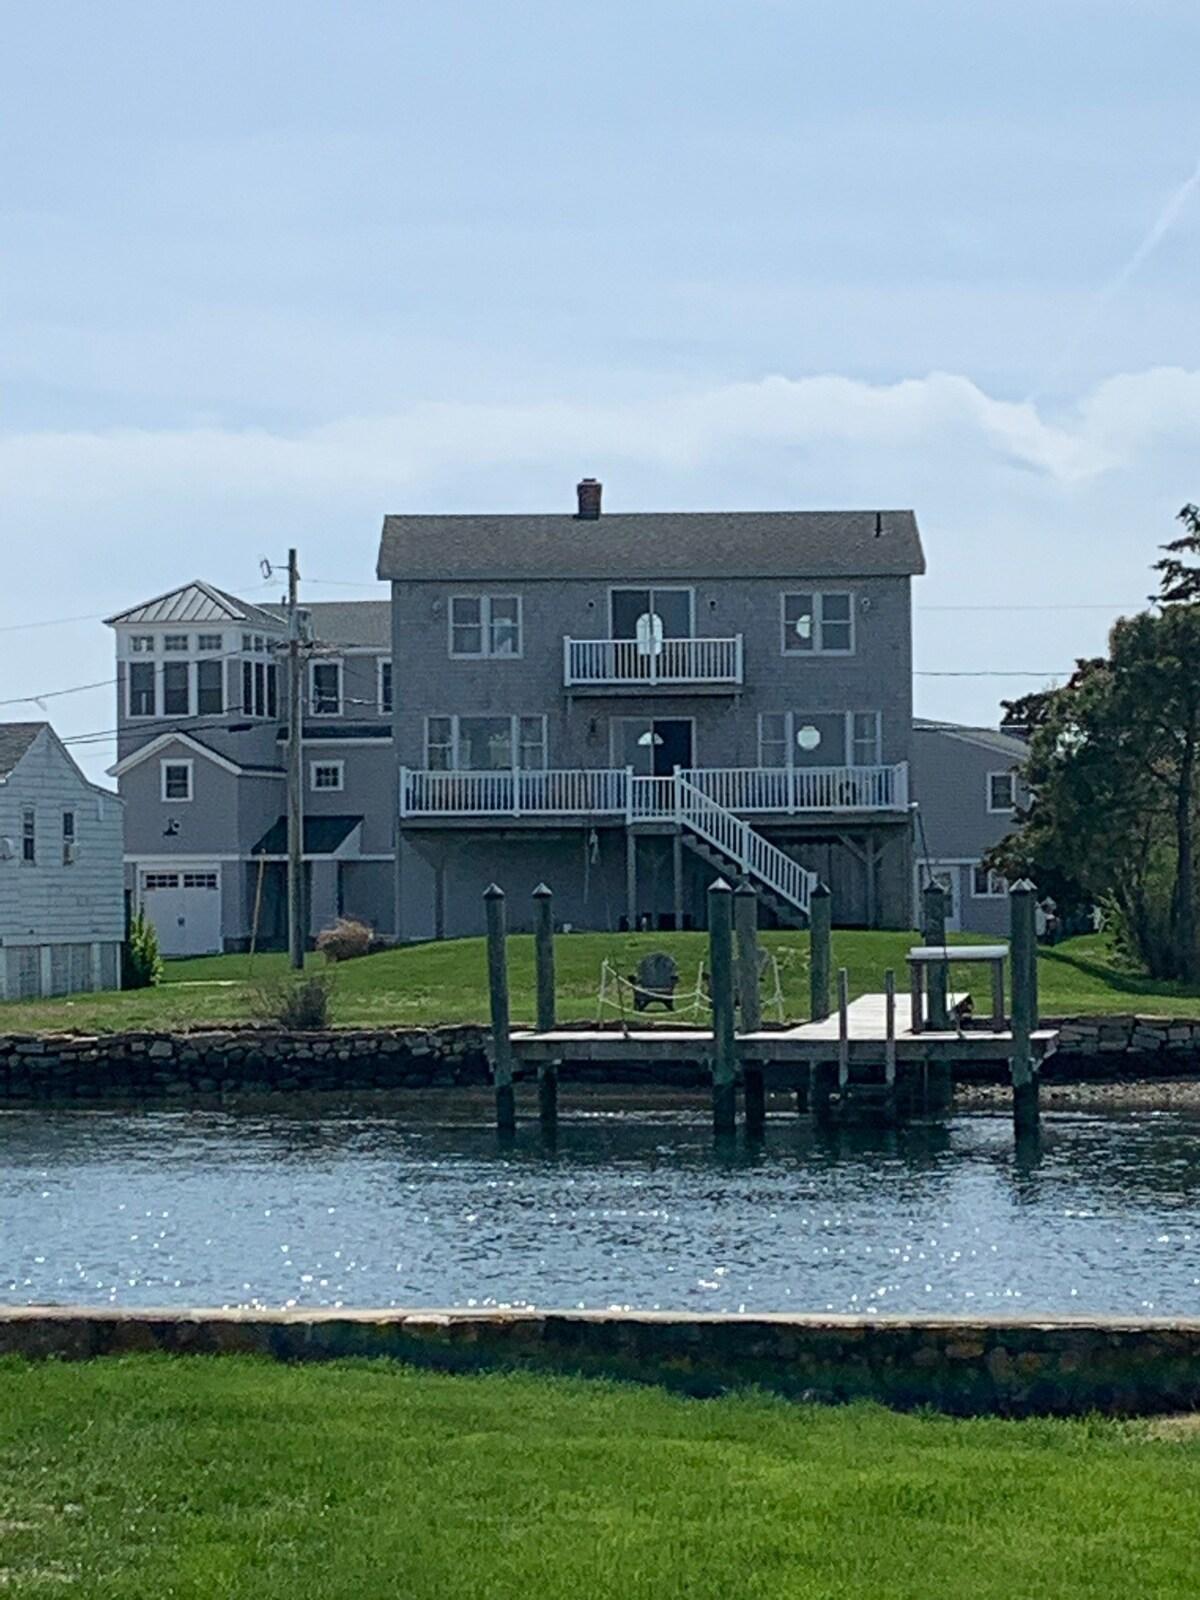 Misquamicut Beach House Rentals : misquamicut, beach, house, rentals, Misquamicut, Beach, Bungalow, Misquamicut,, Rhode, Island, (RI),, Bedroom,, Bathroom)